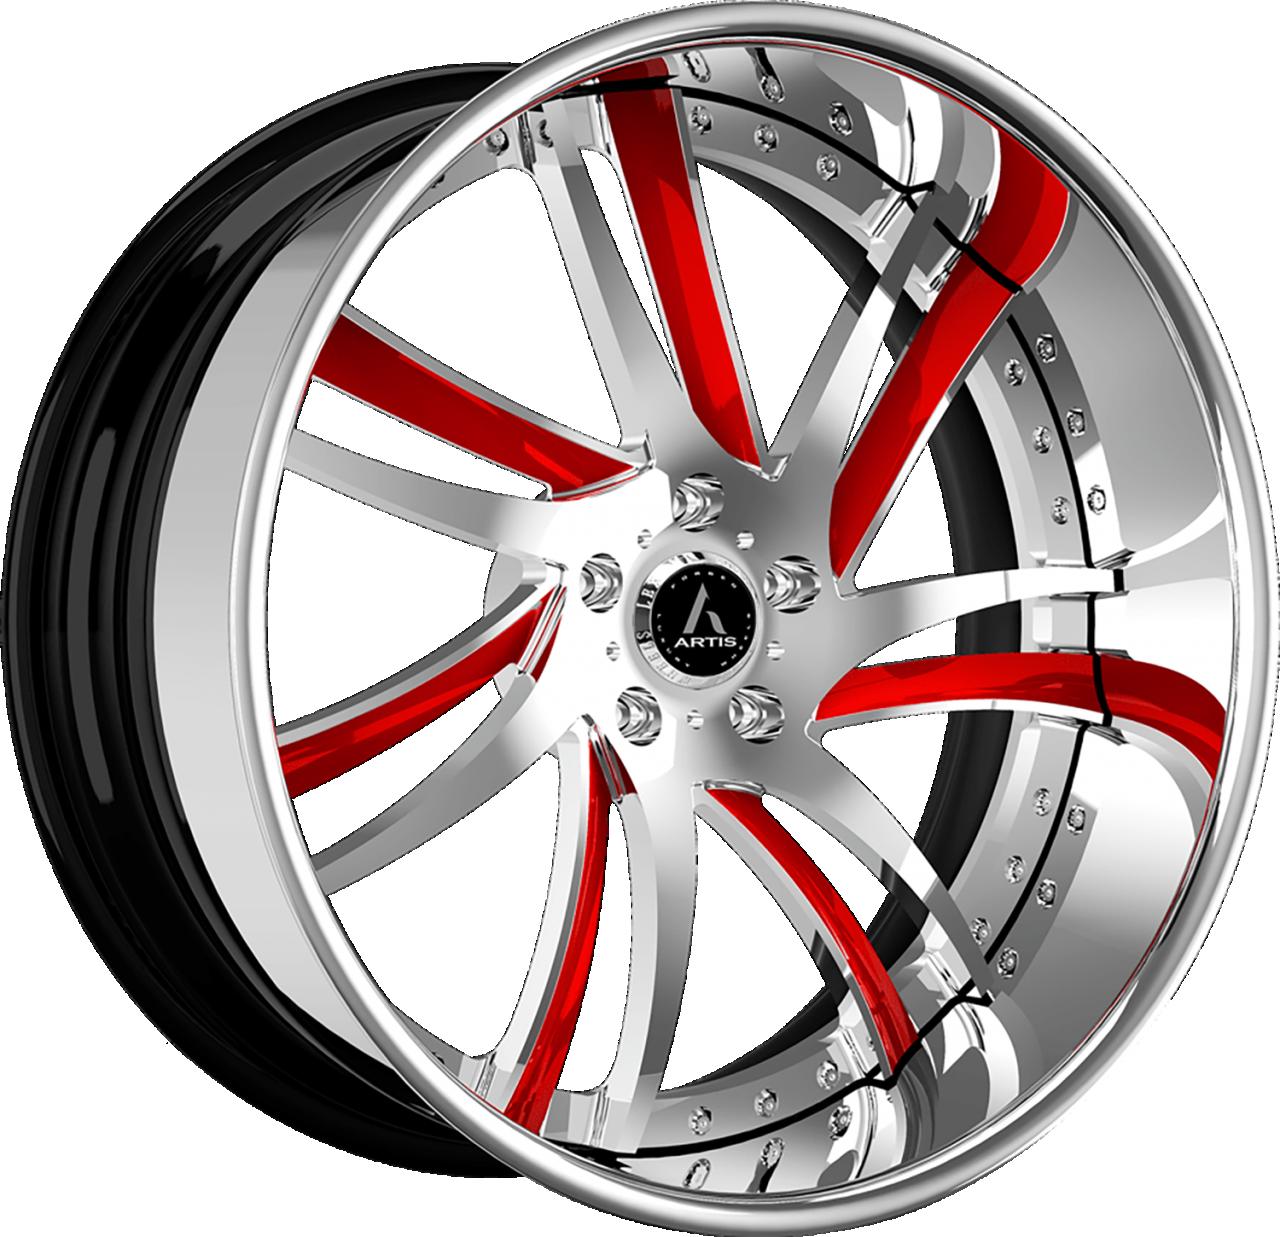 Artis Forged Profile wheel with Custom finish